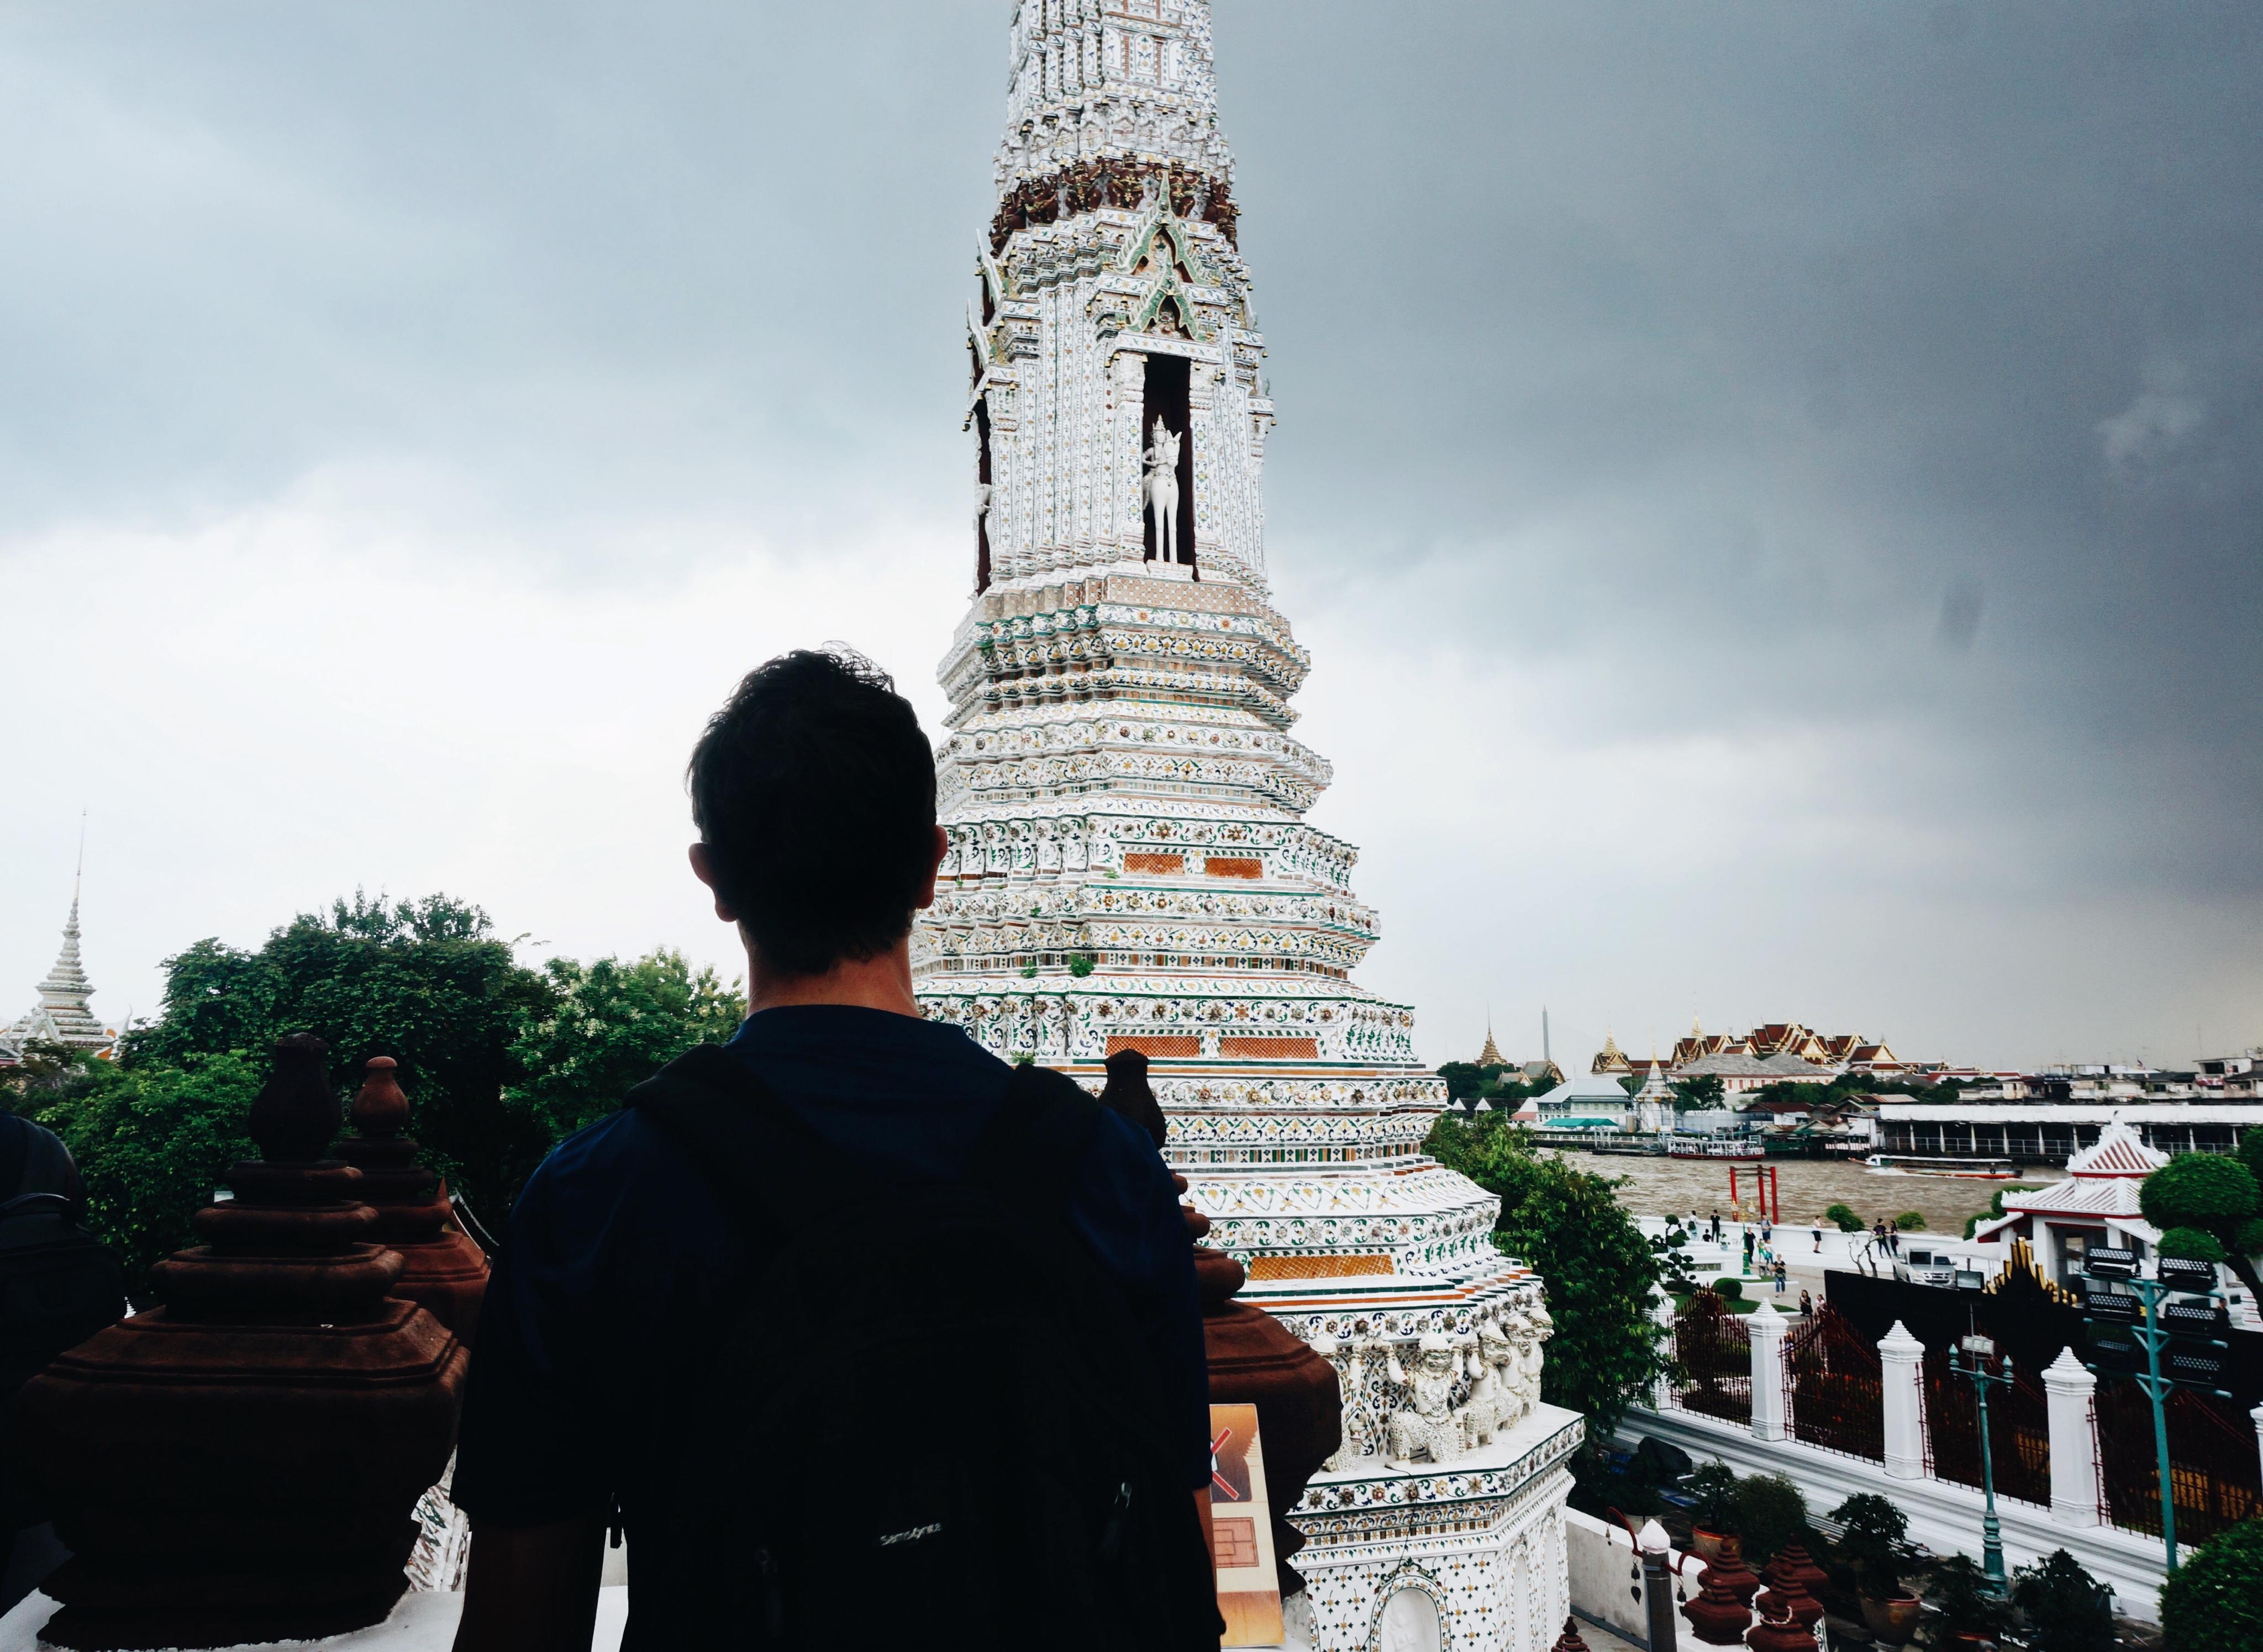 Tempel in Thailand, Tempeltour in Bangkok, Sehenswürdigkeiten Bangkok